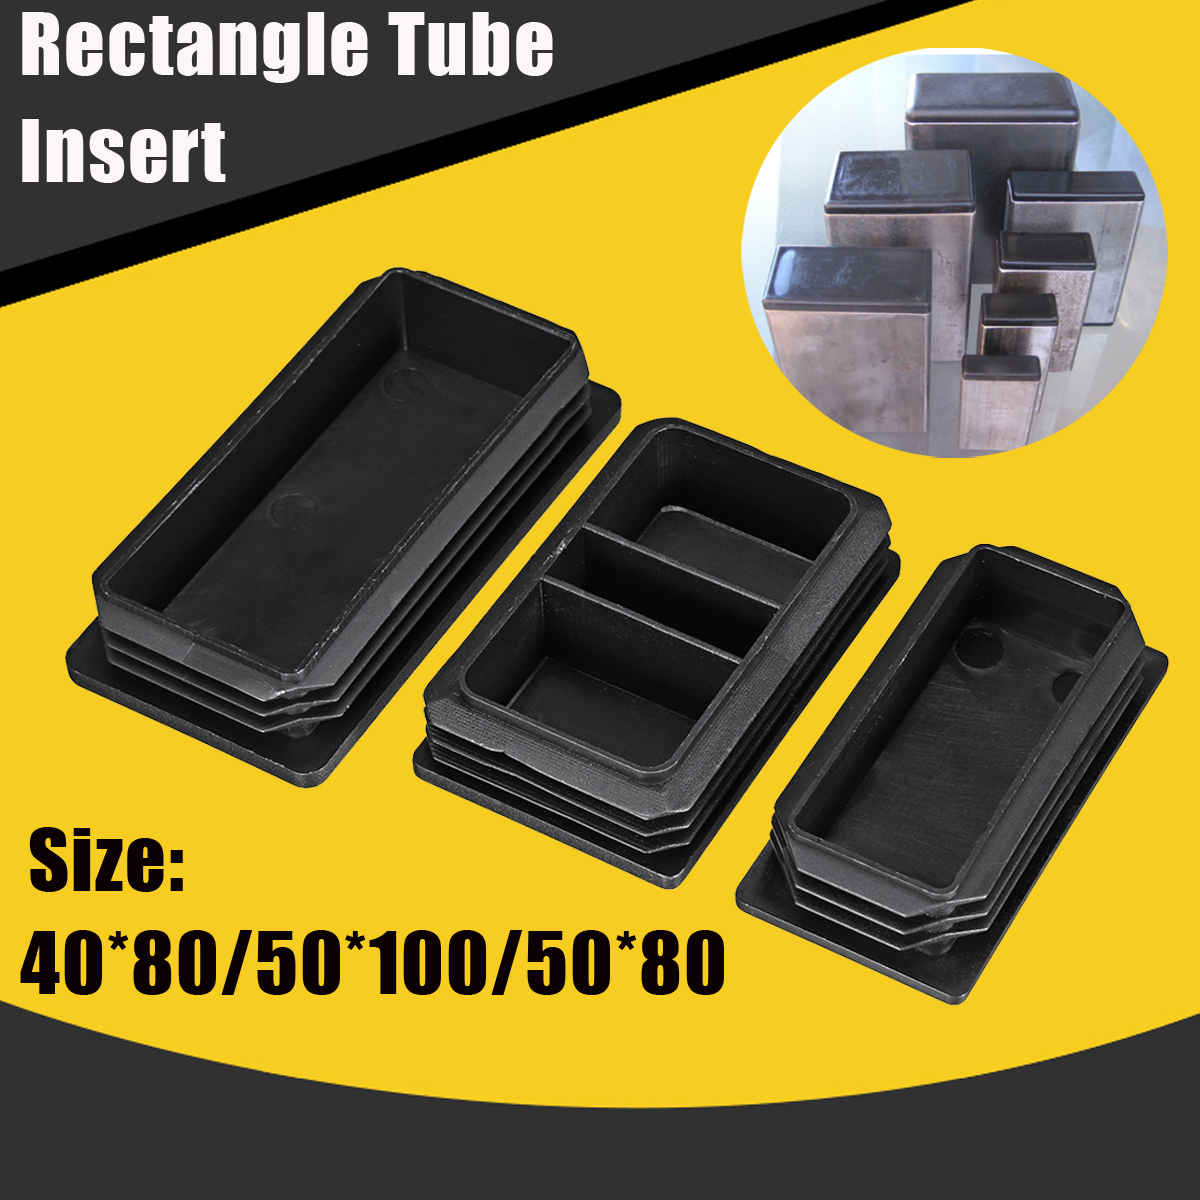 New 40x80/50x100/50x80 Rectangle Tubing Insert Plastic End Cap Finishing Plug Oblong Hole Insert